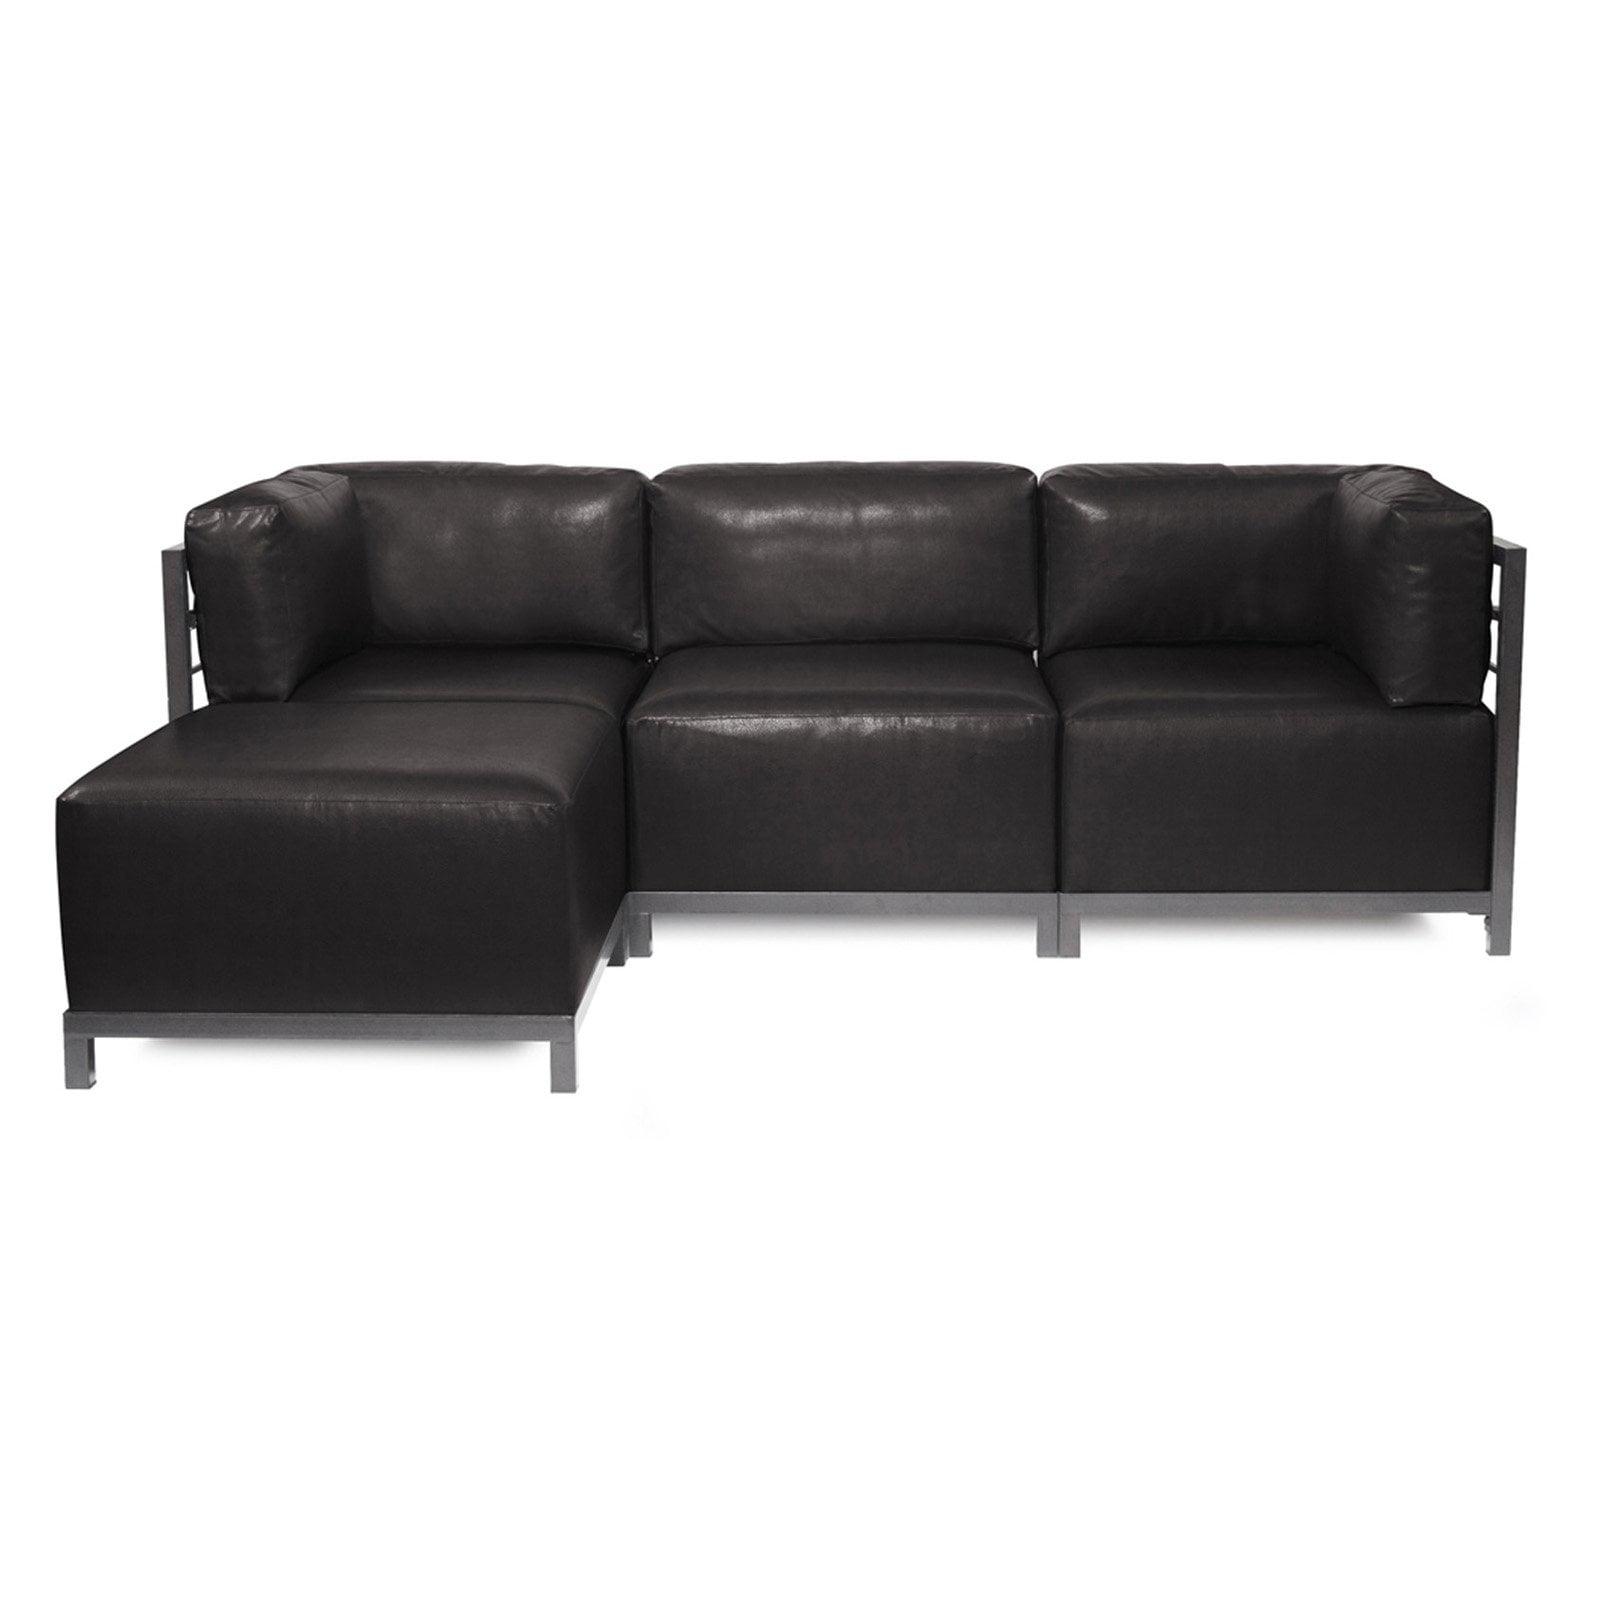 Elizabeth austin axis avanti 4 piece sectional sofa walmart com